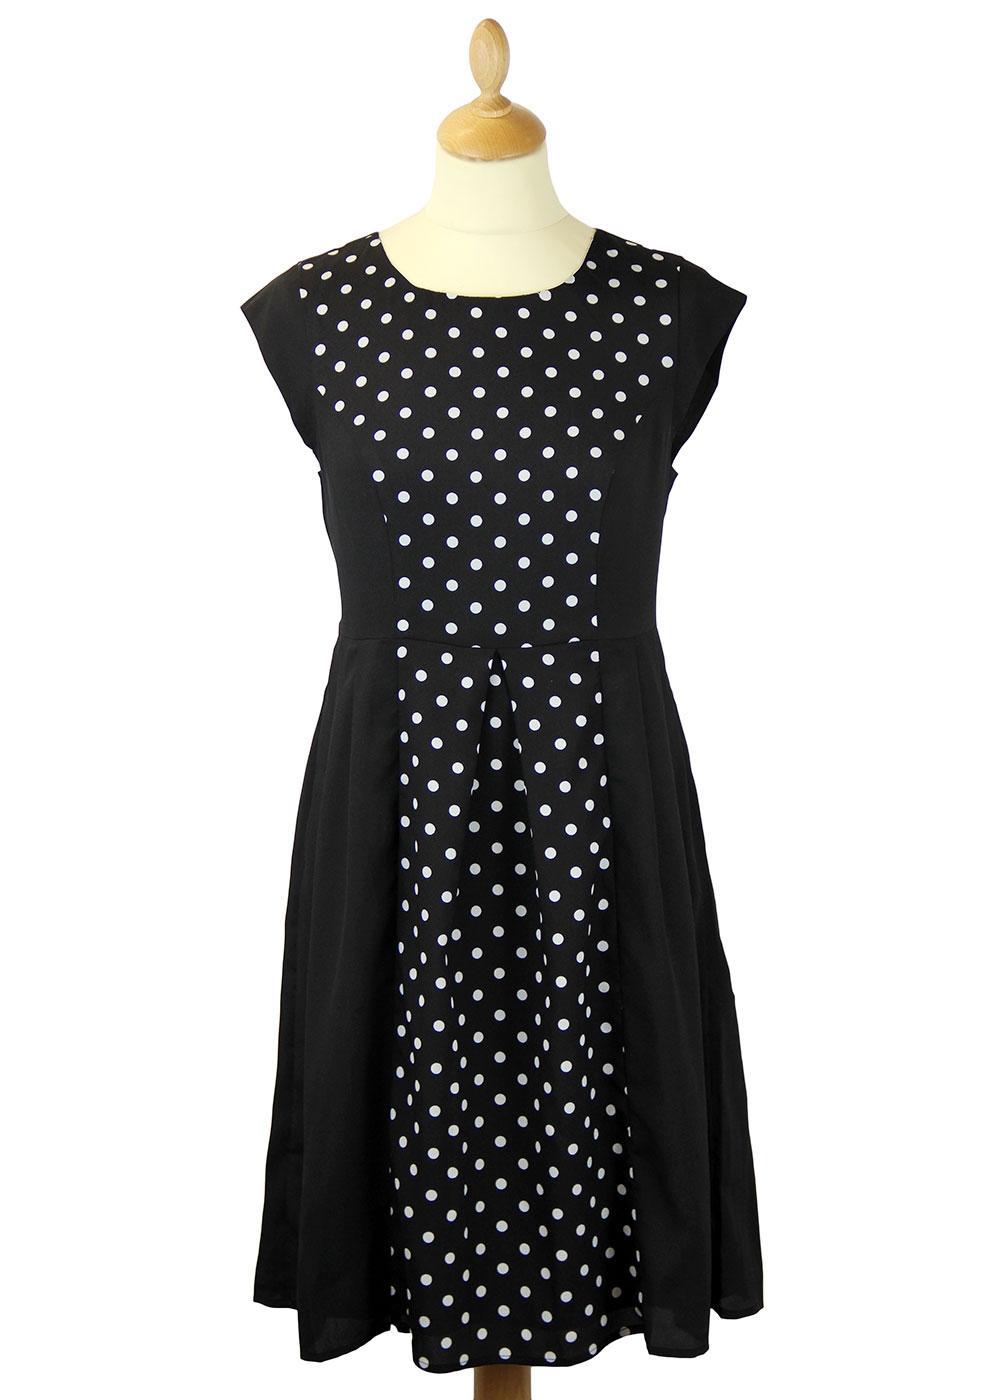 Lily DARLING Retro 60s Polka Dot Dress(B)